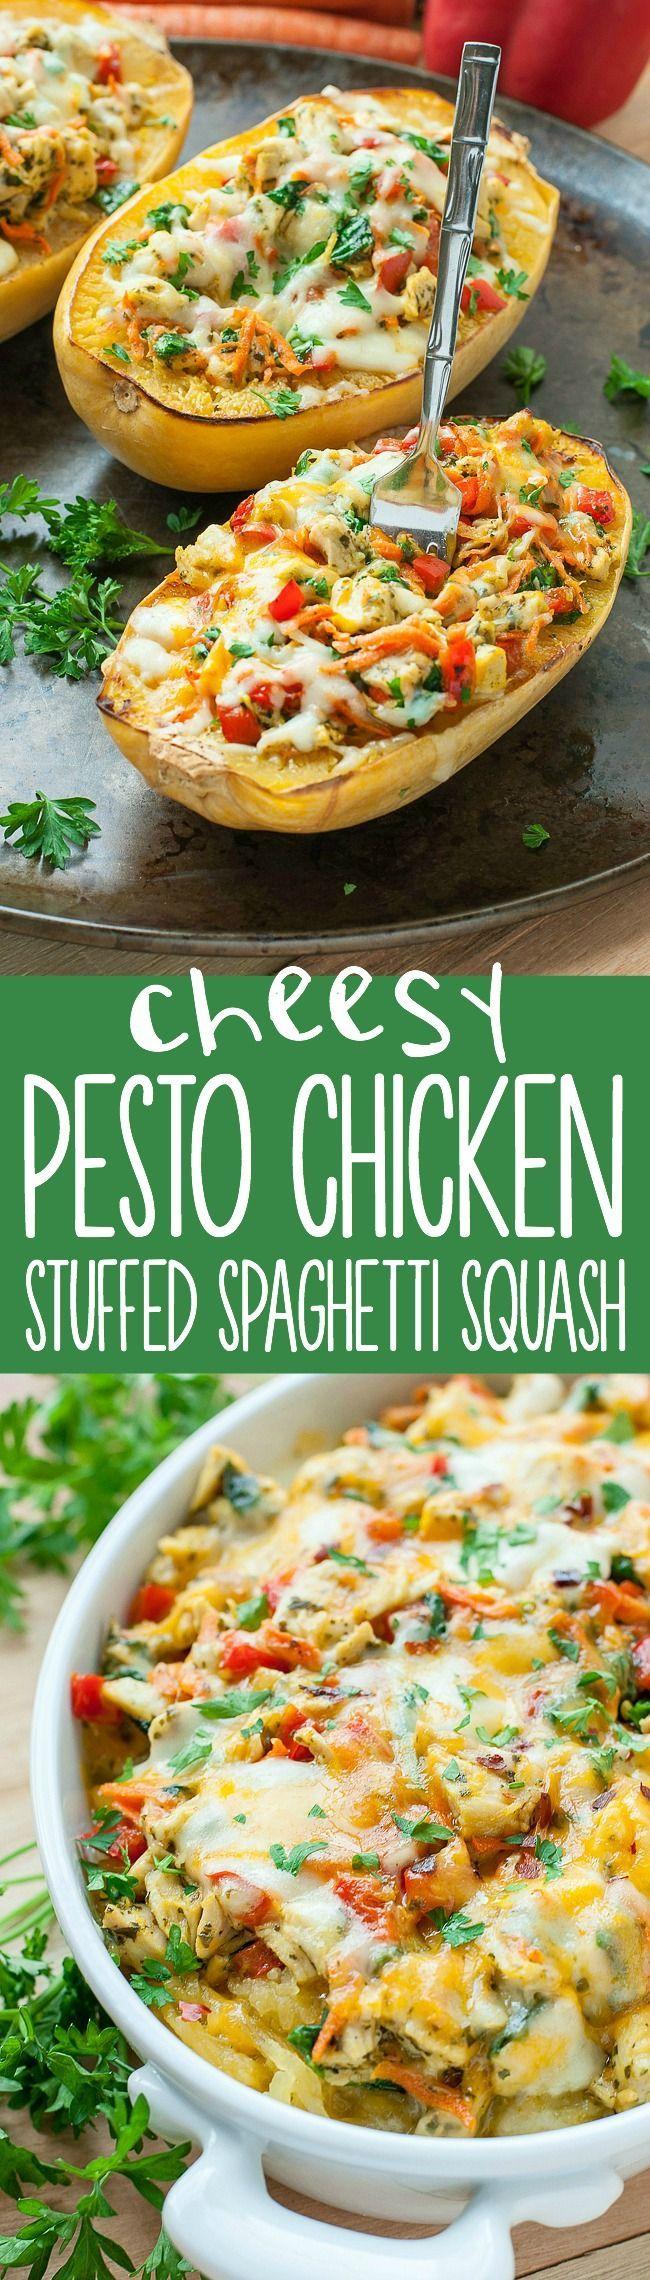 Cheesy Pesto Chicken and Veggie Stuffed Spaghetti Squash